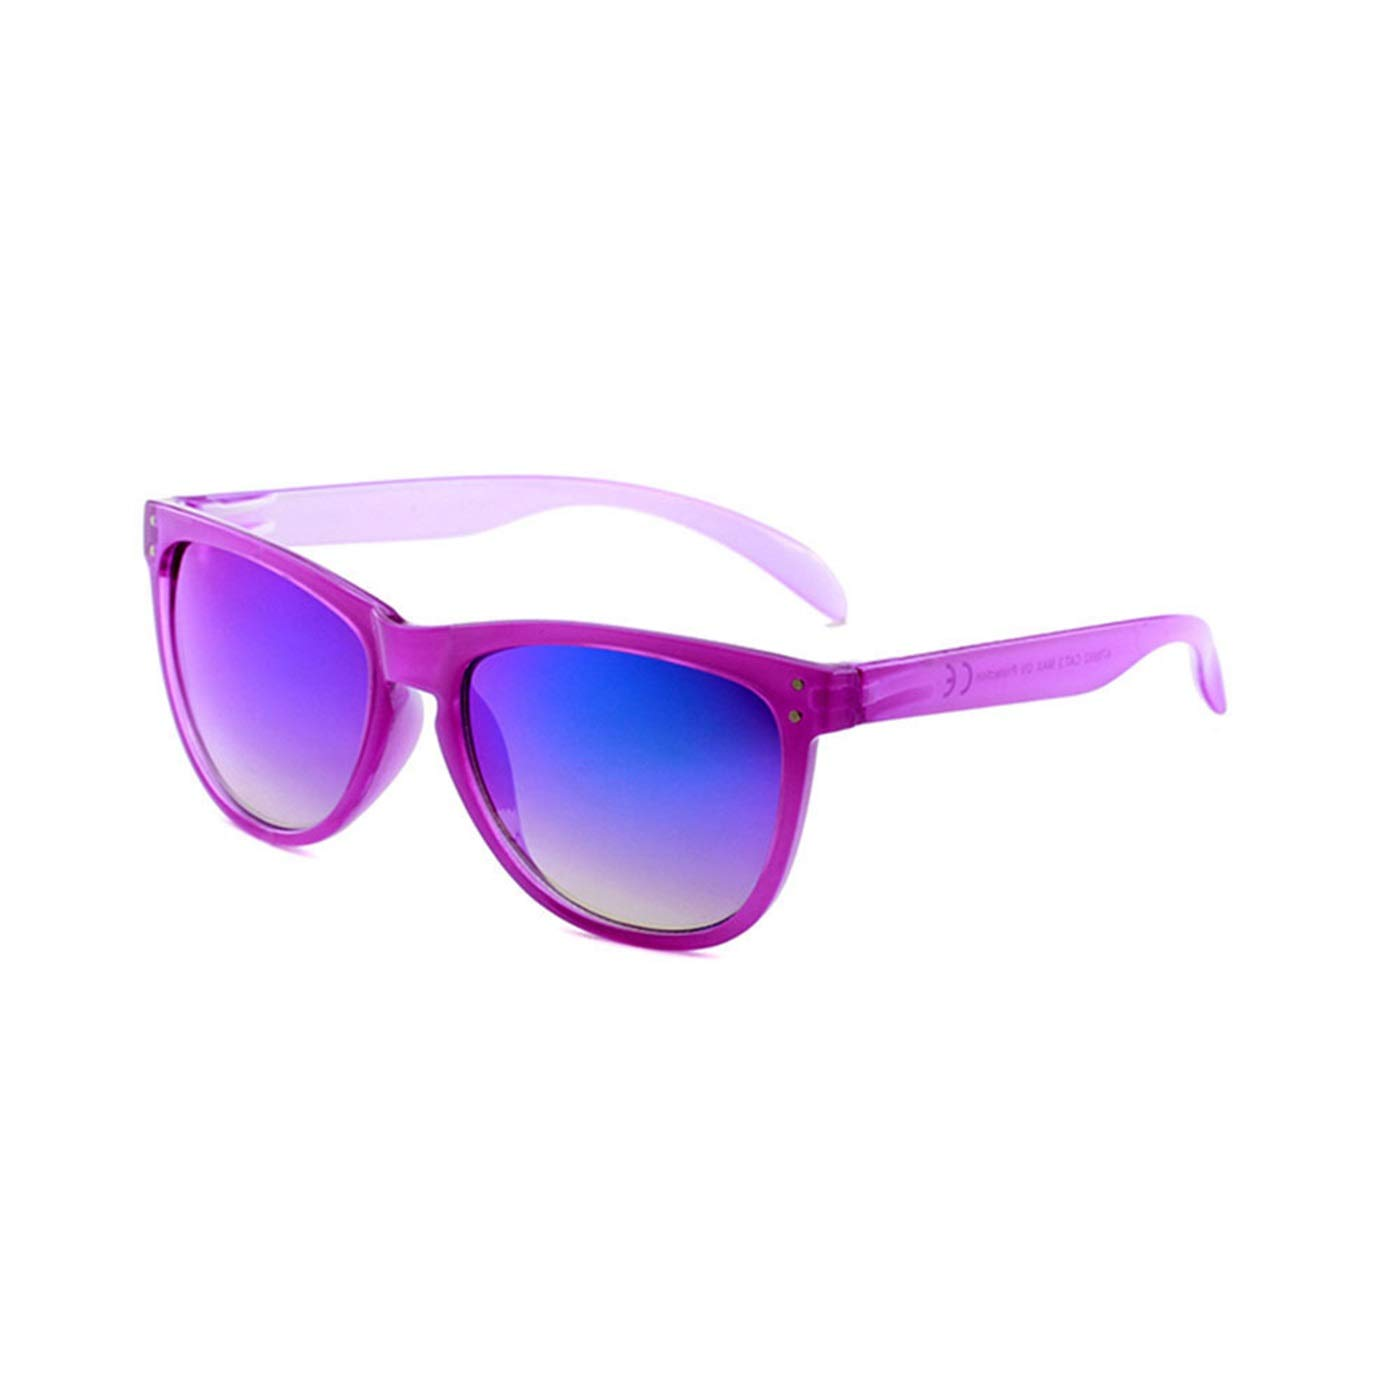 Sunglasses Women Men Driving Frame Sun Glasses Male Goggle UV400